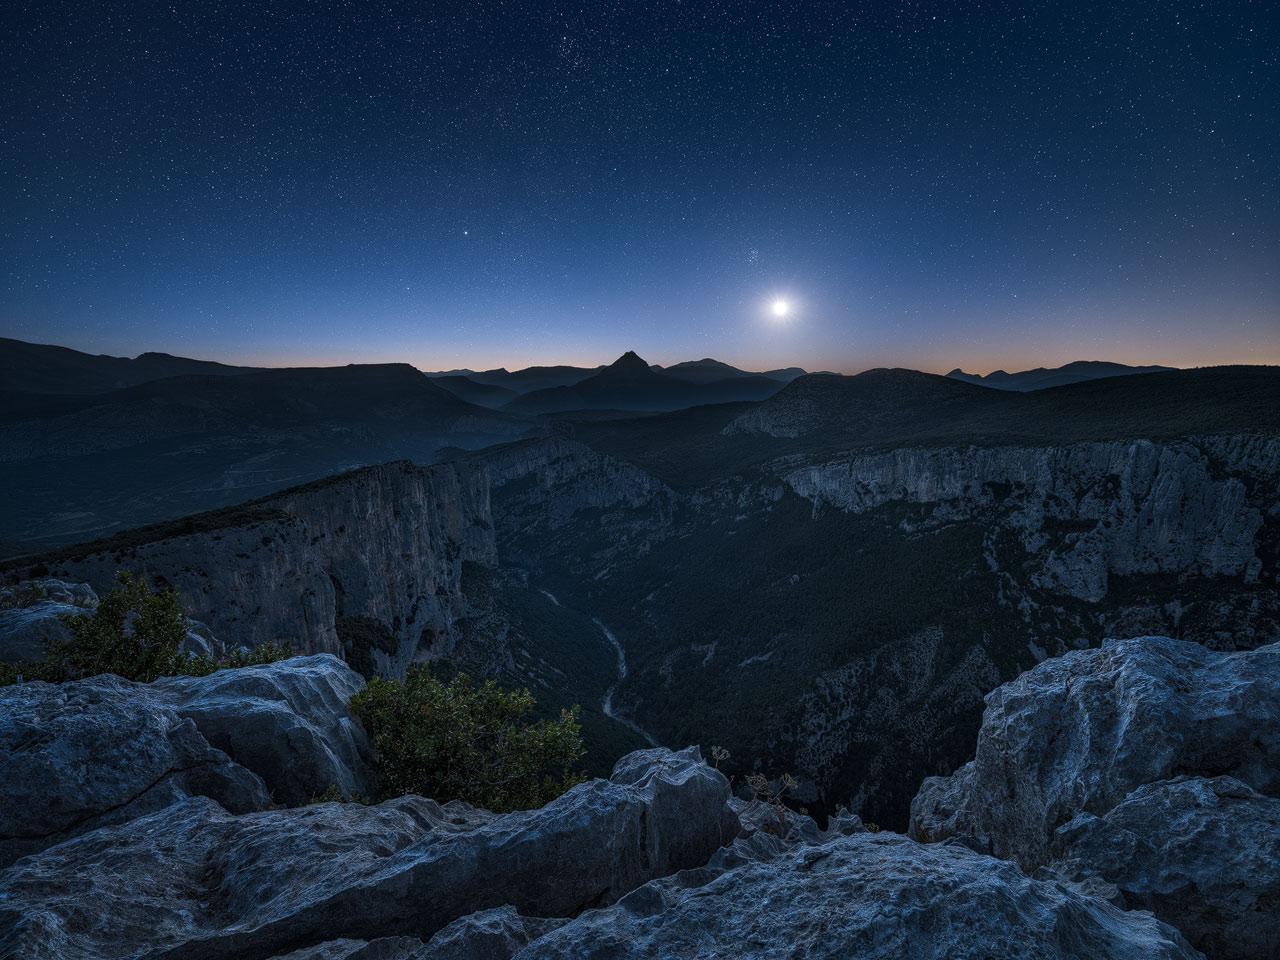 Night Photography Example - Verdon Moonrise